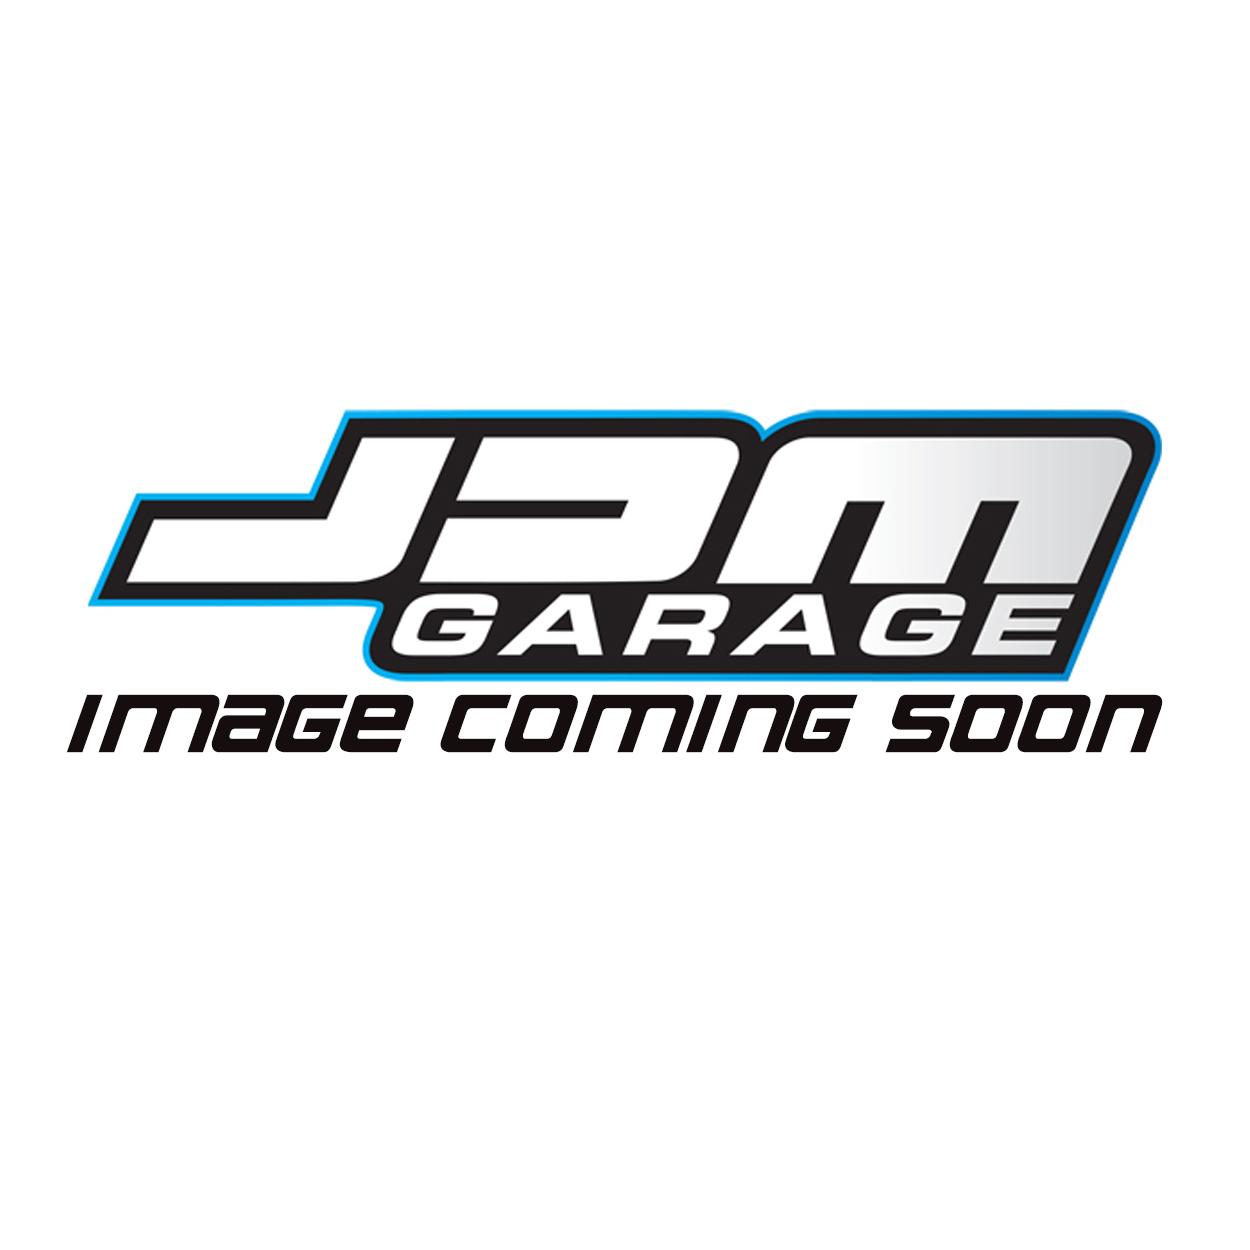 Genuine Nissan Front Heater Return Water Pipe Assembly For Silvia S14 S15 SR20DE SR20DET 14053-65F01